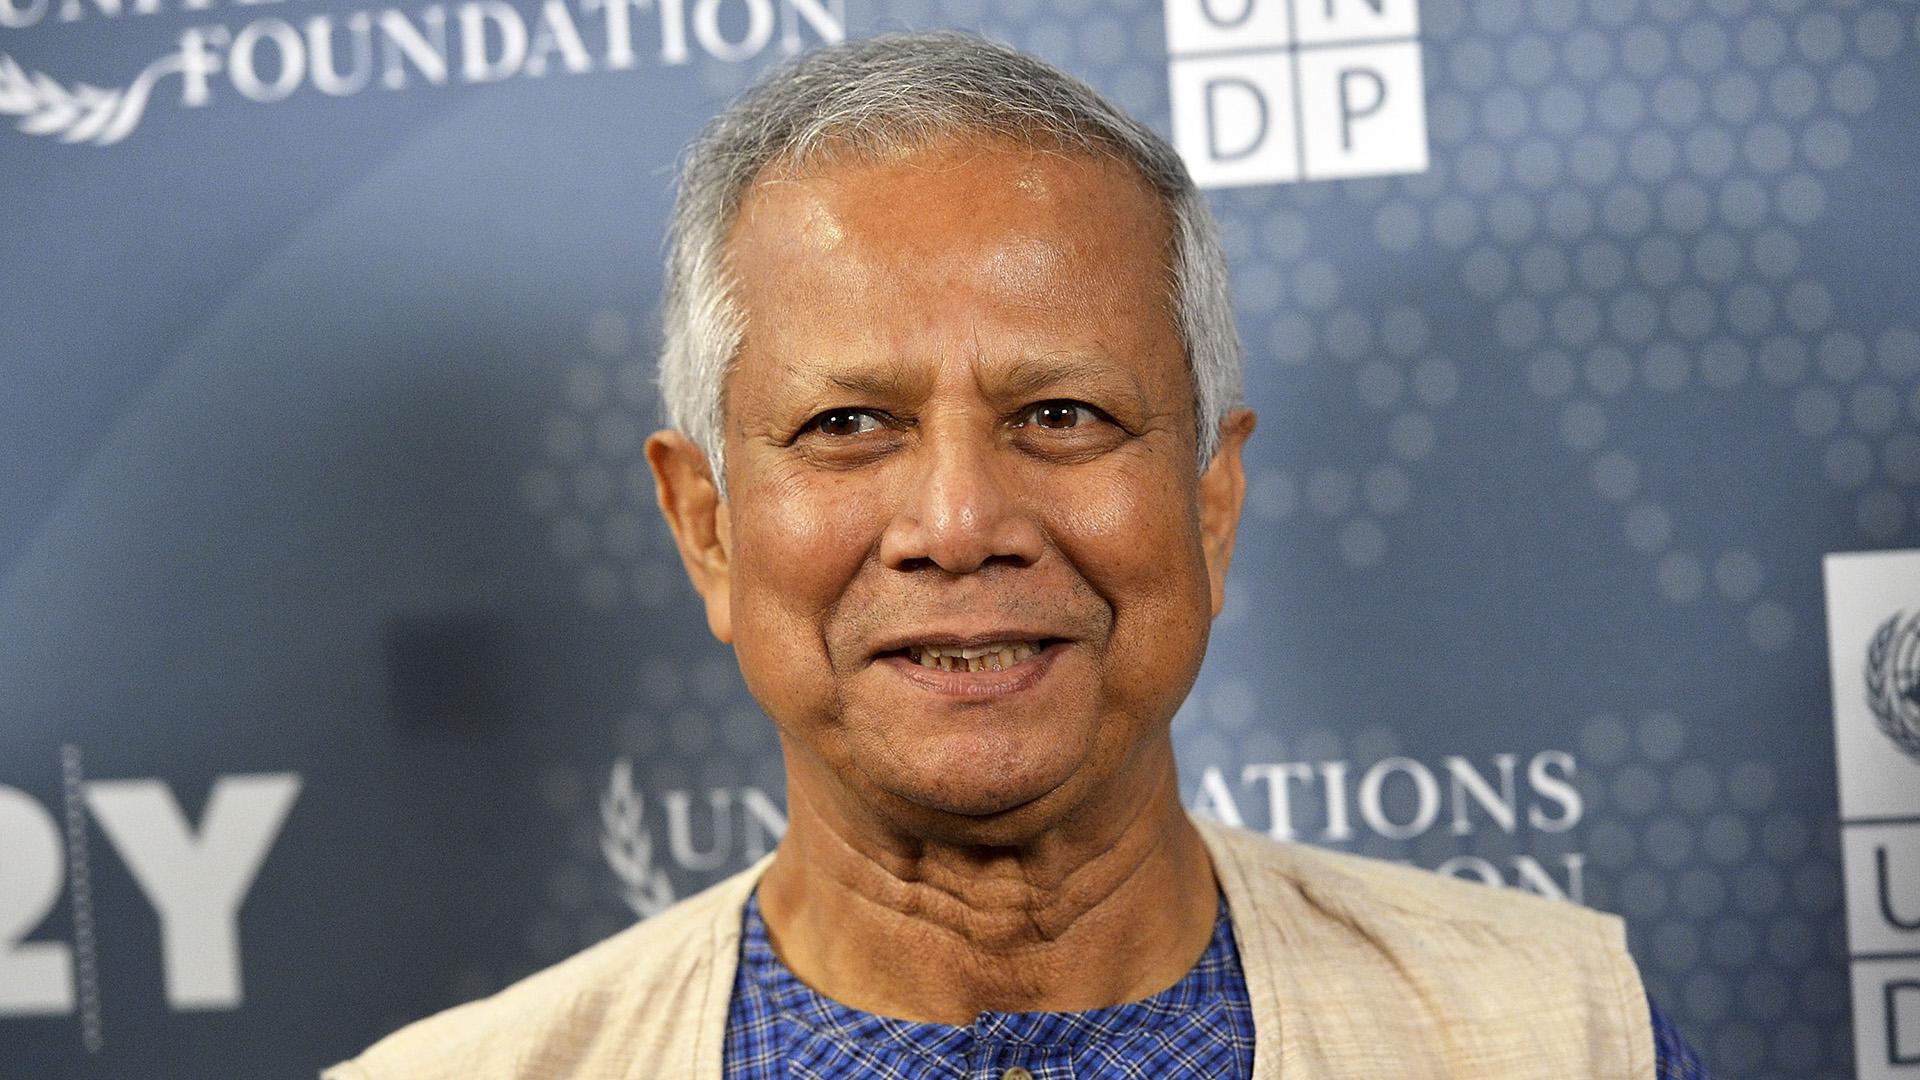 Bangladesh Nobel Laureate Muhammad Yunus To Get Second Olympic Laurel